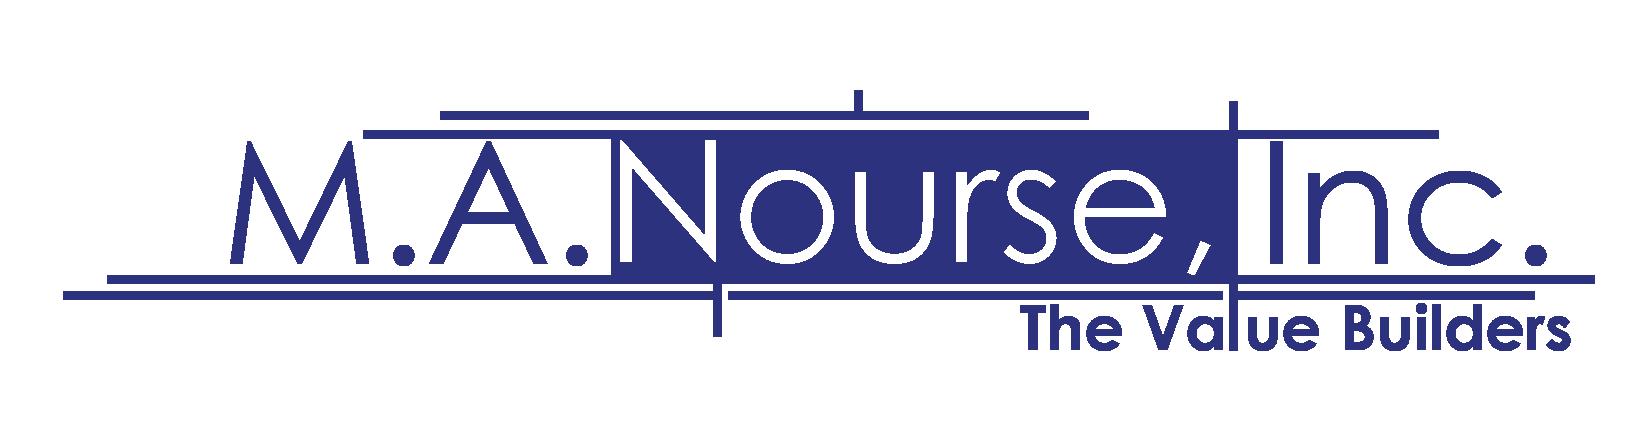 MA Nourse